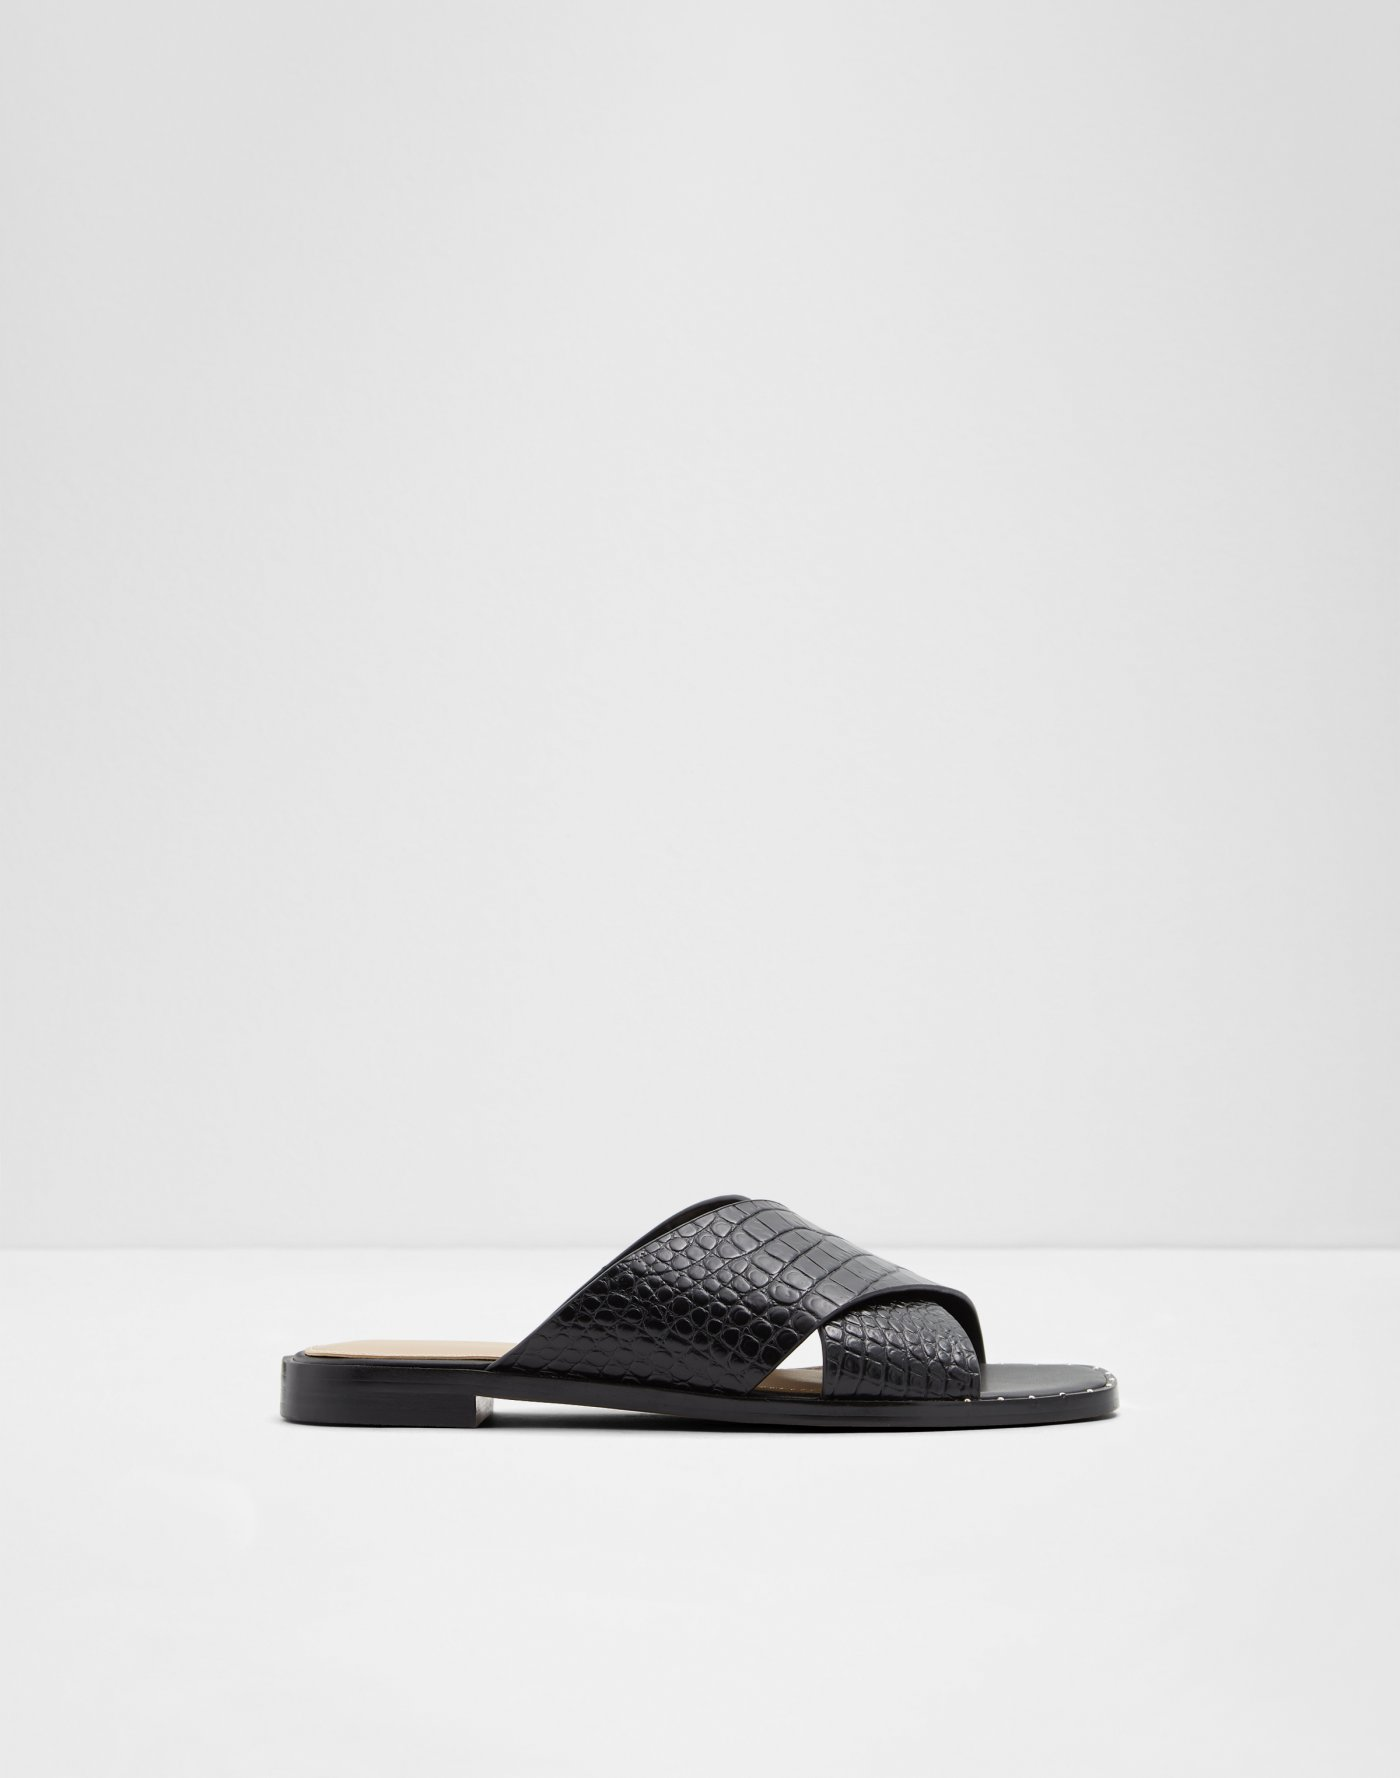 73ea7cba0 Flat sandals | Aldoshoes.com US